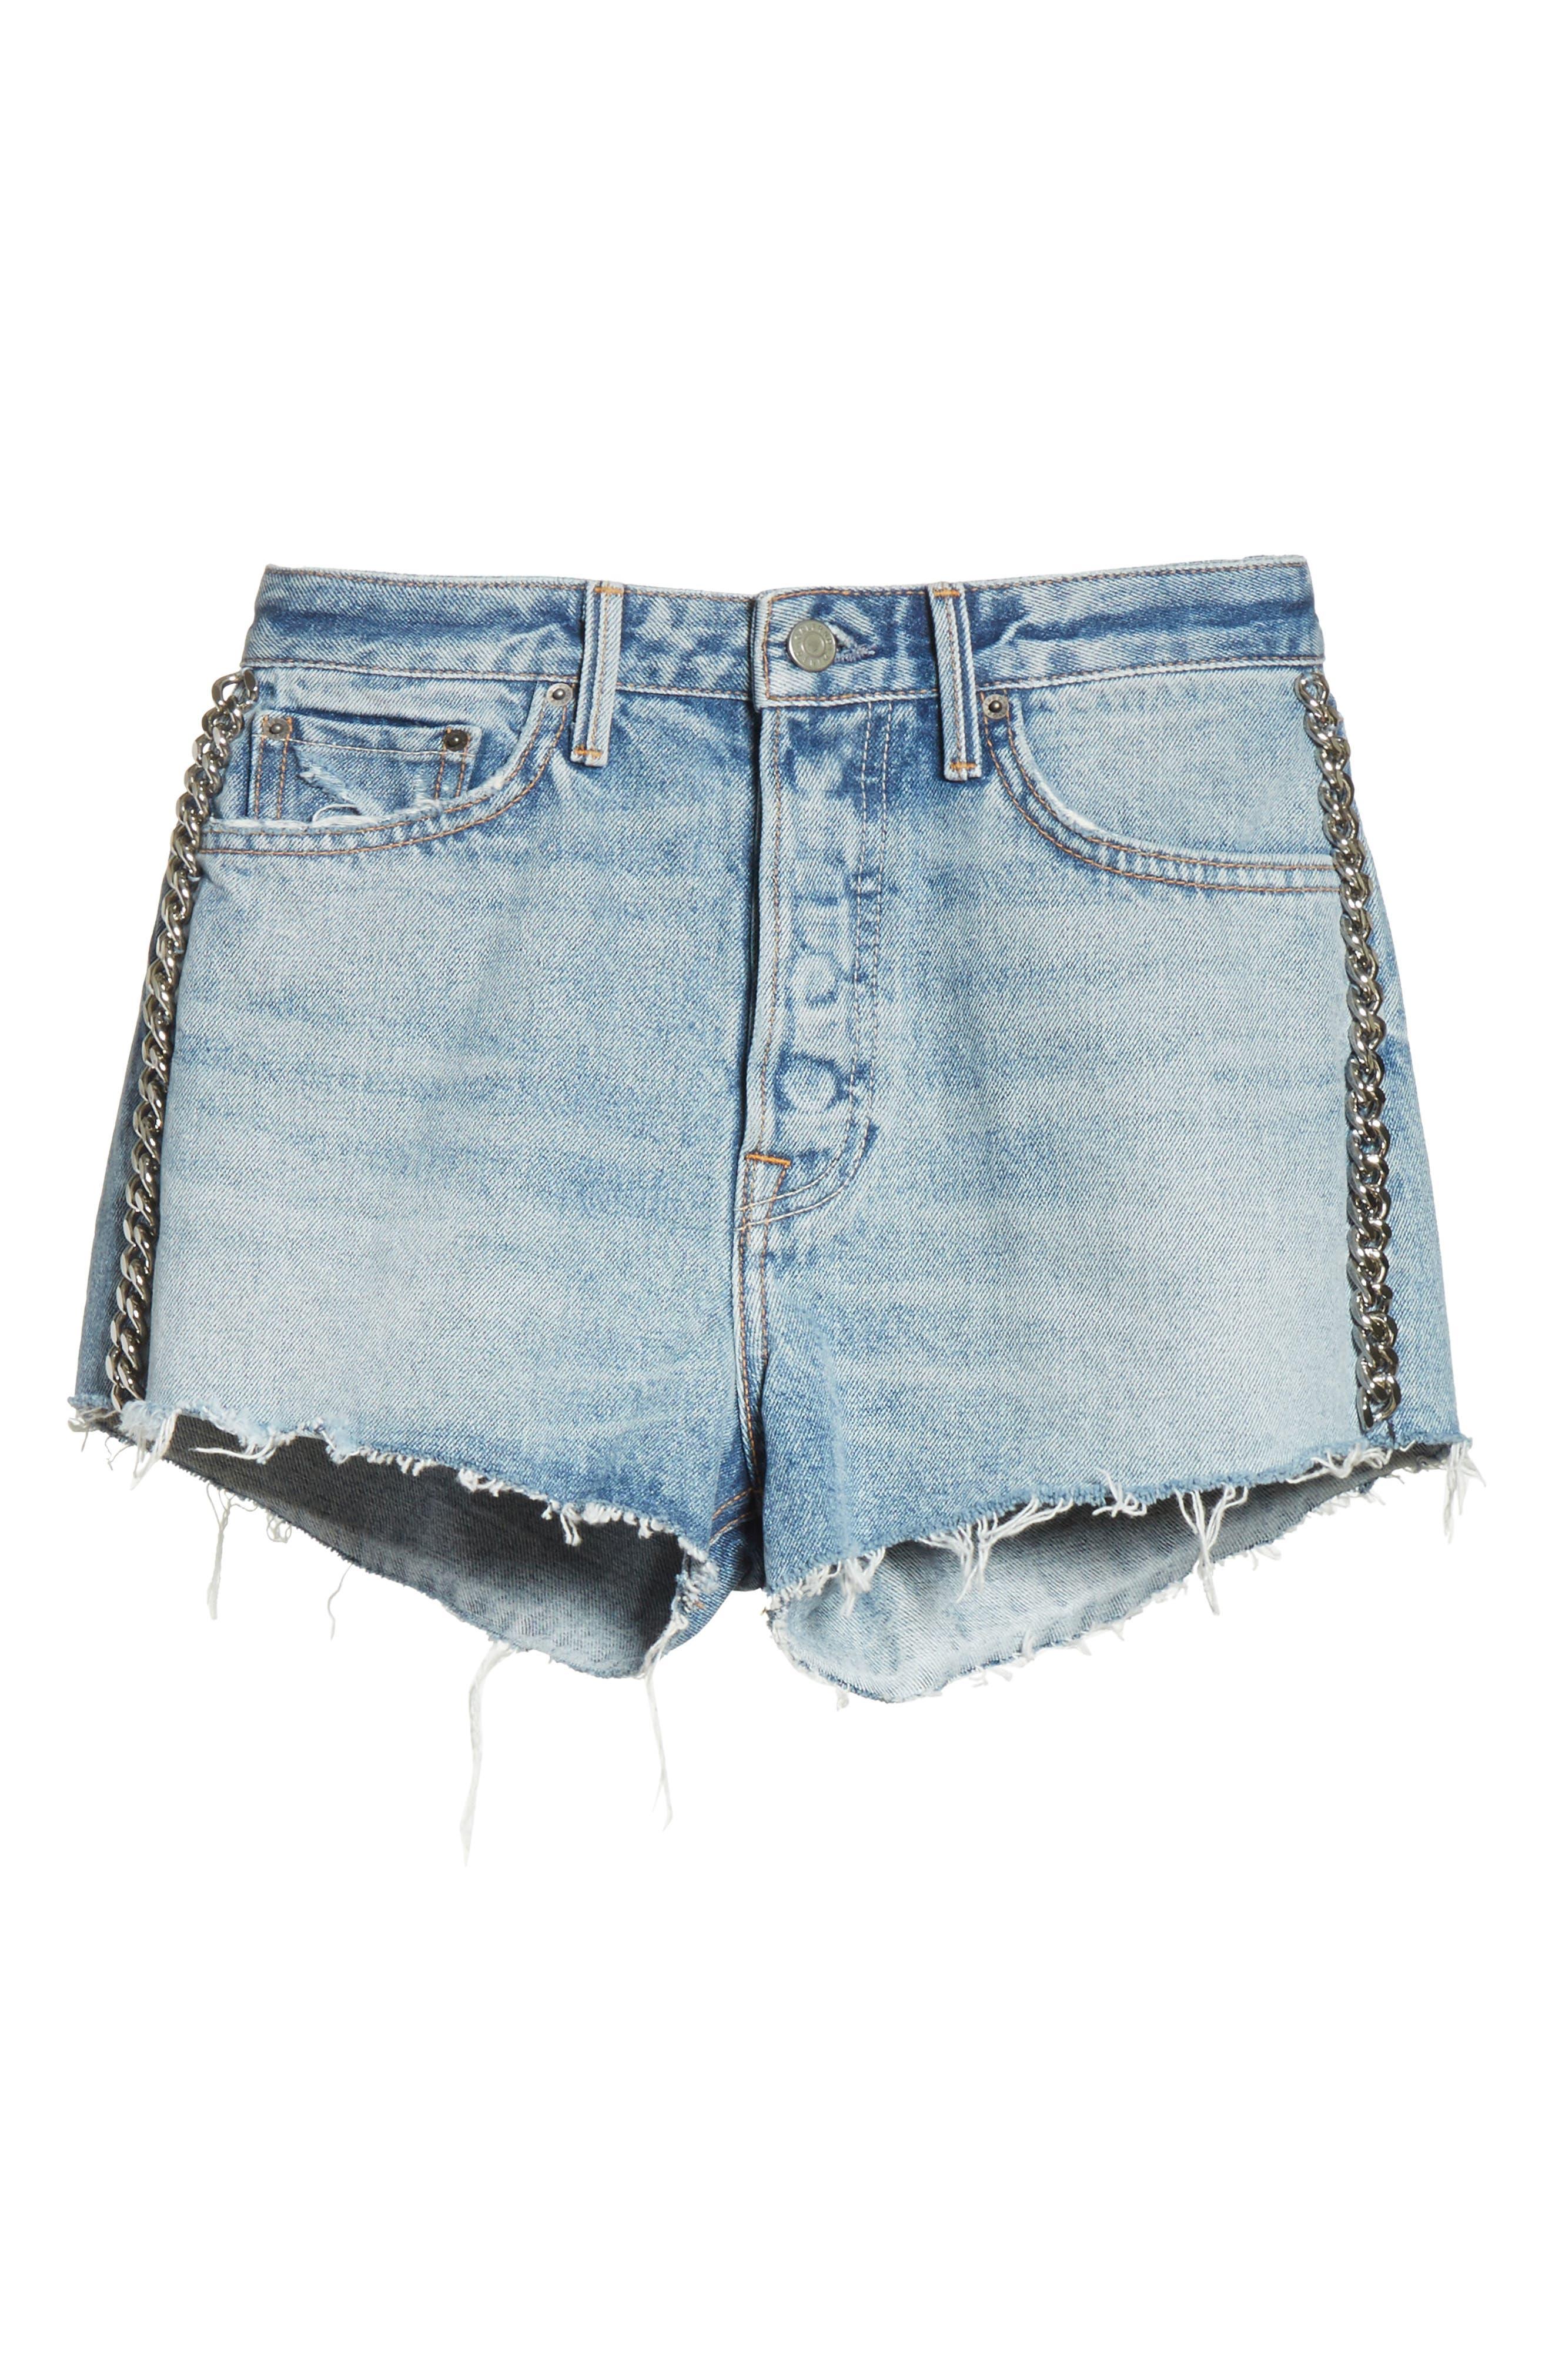 Cindy Rigid High Waist Denim Shorts,                             Alternate thumbnail 6, color,                             484